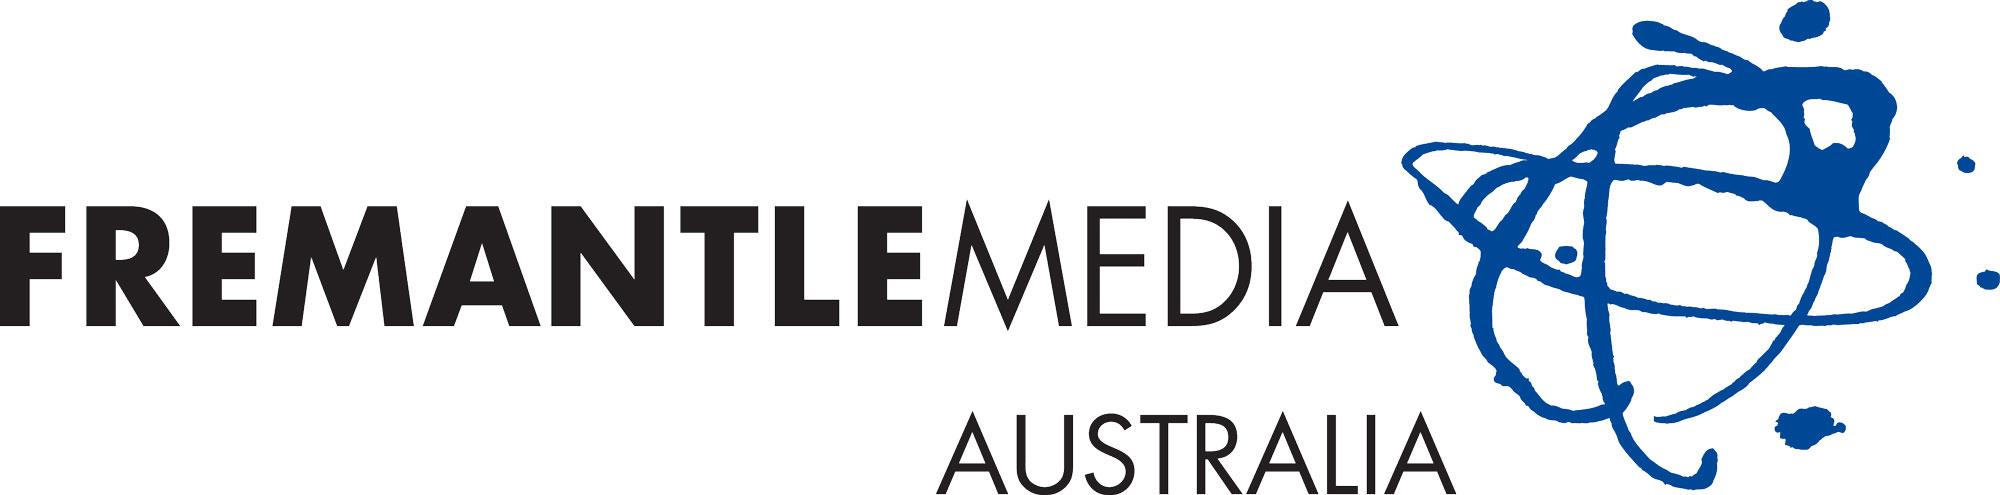 2000px_FMA_Logo.jpg